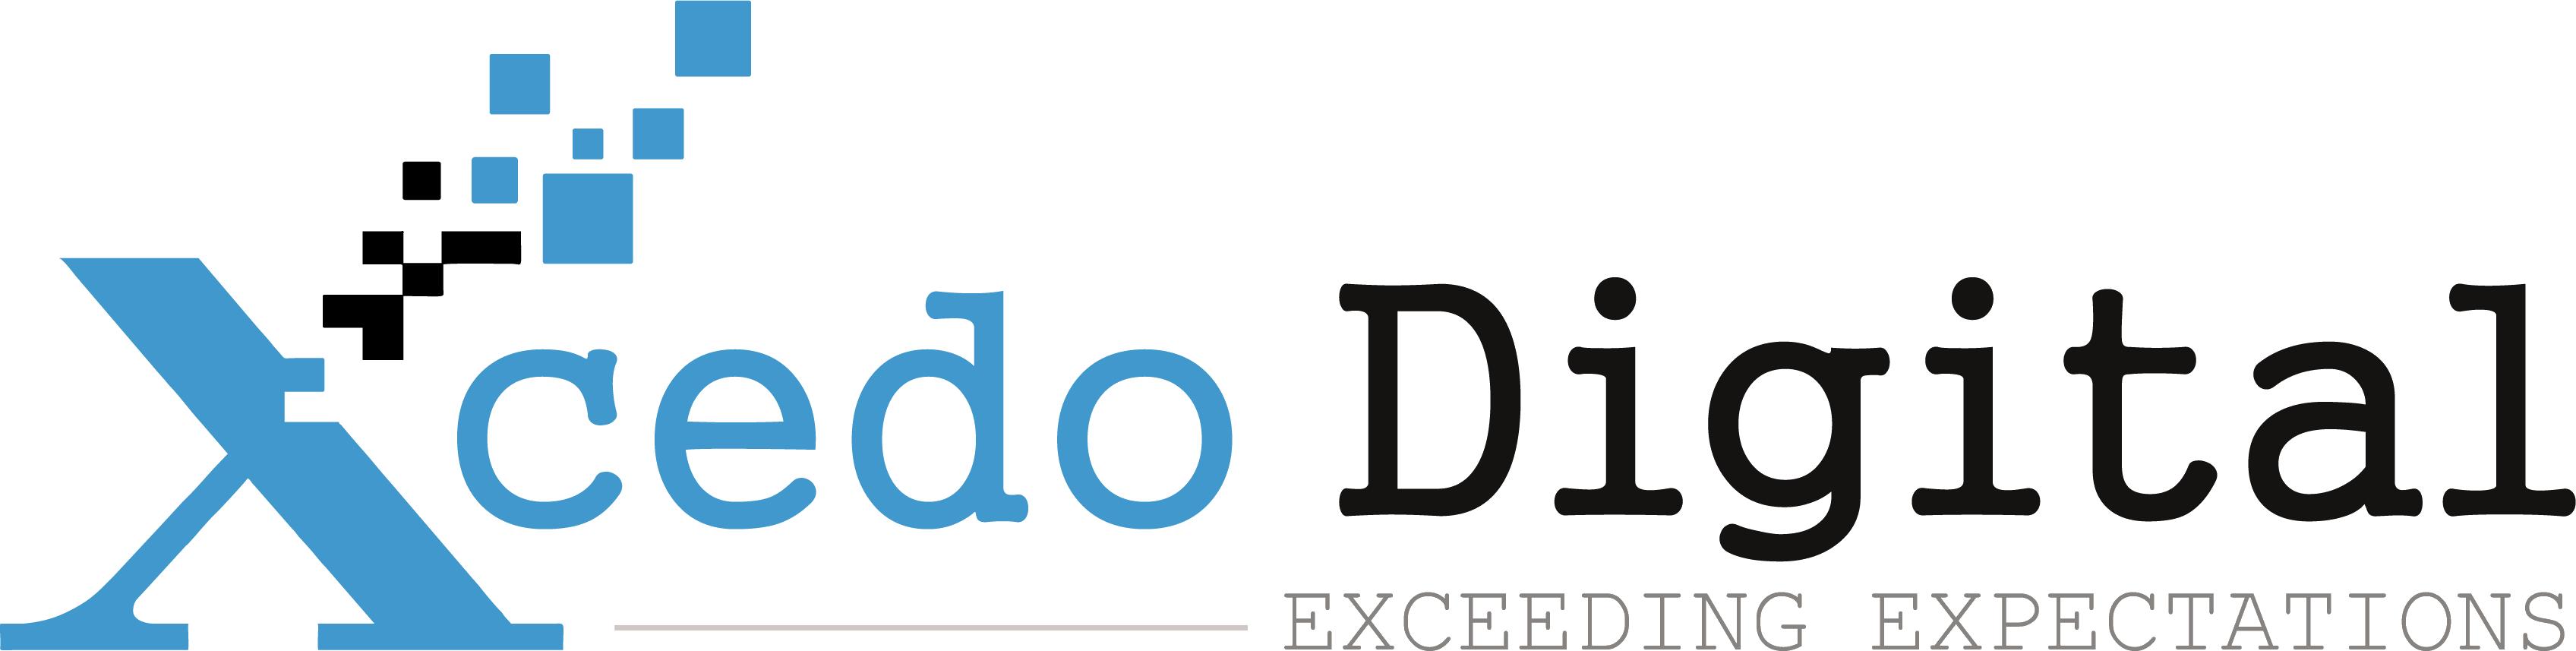 Xcedo Digital